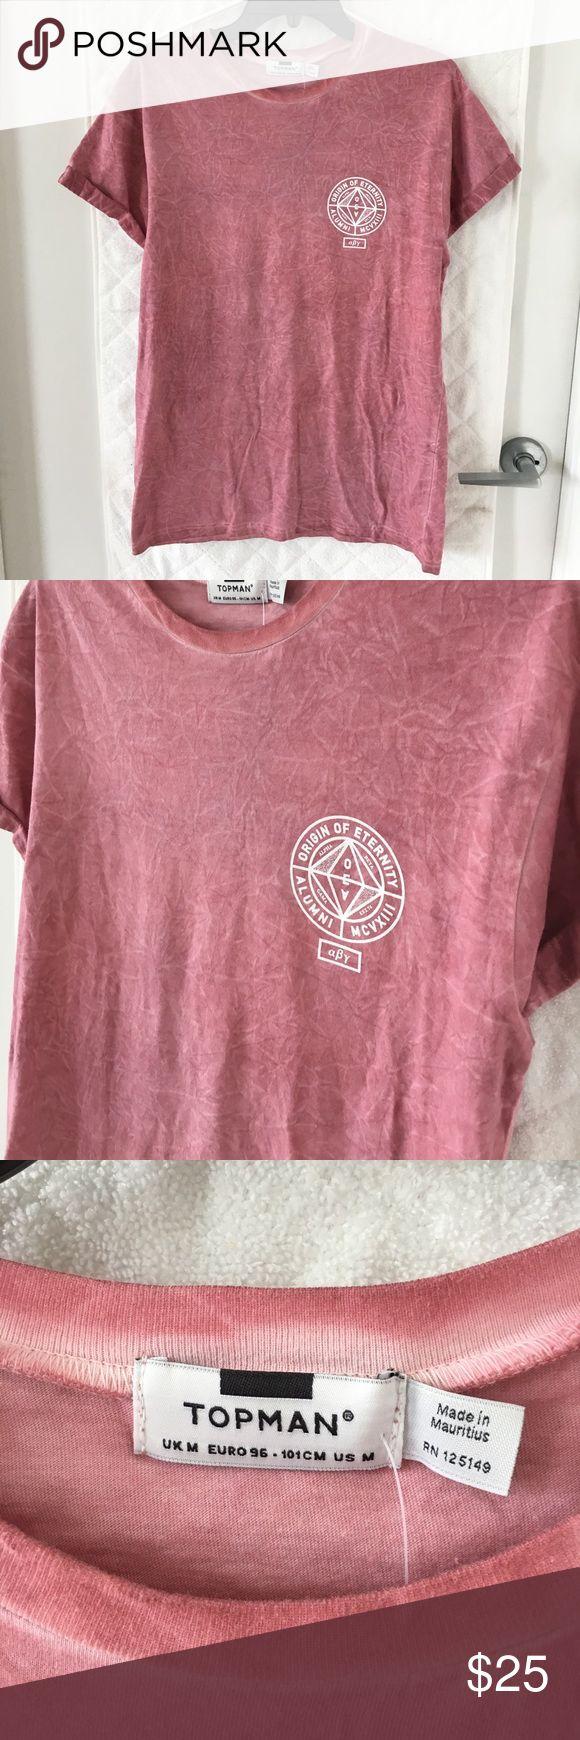 Topman TShirt Topman t shirt - M Topman Shirts Tees - Short Sleeve